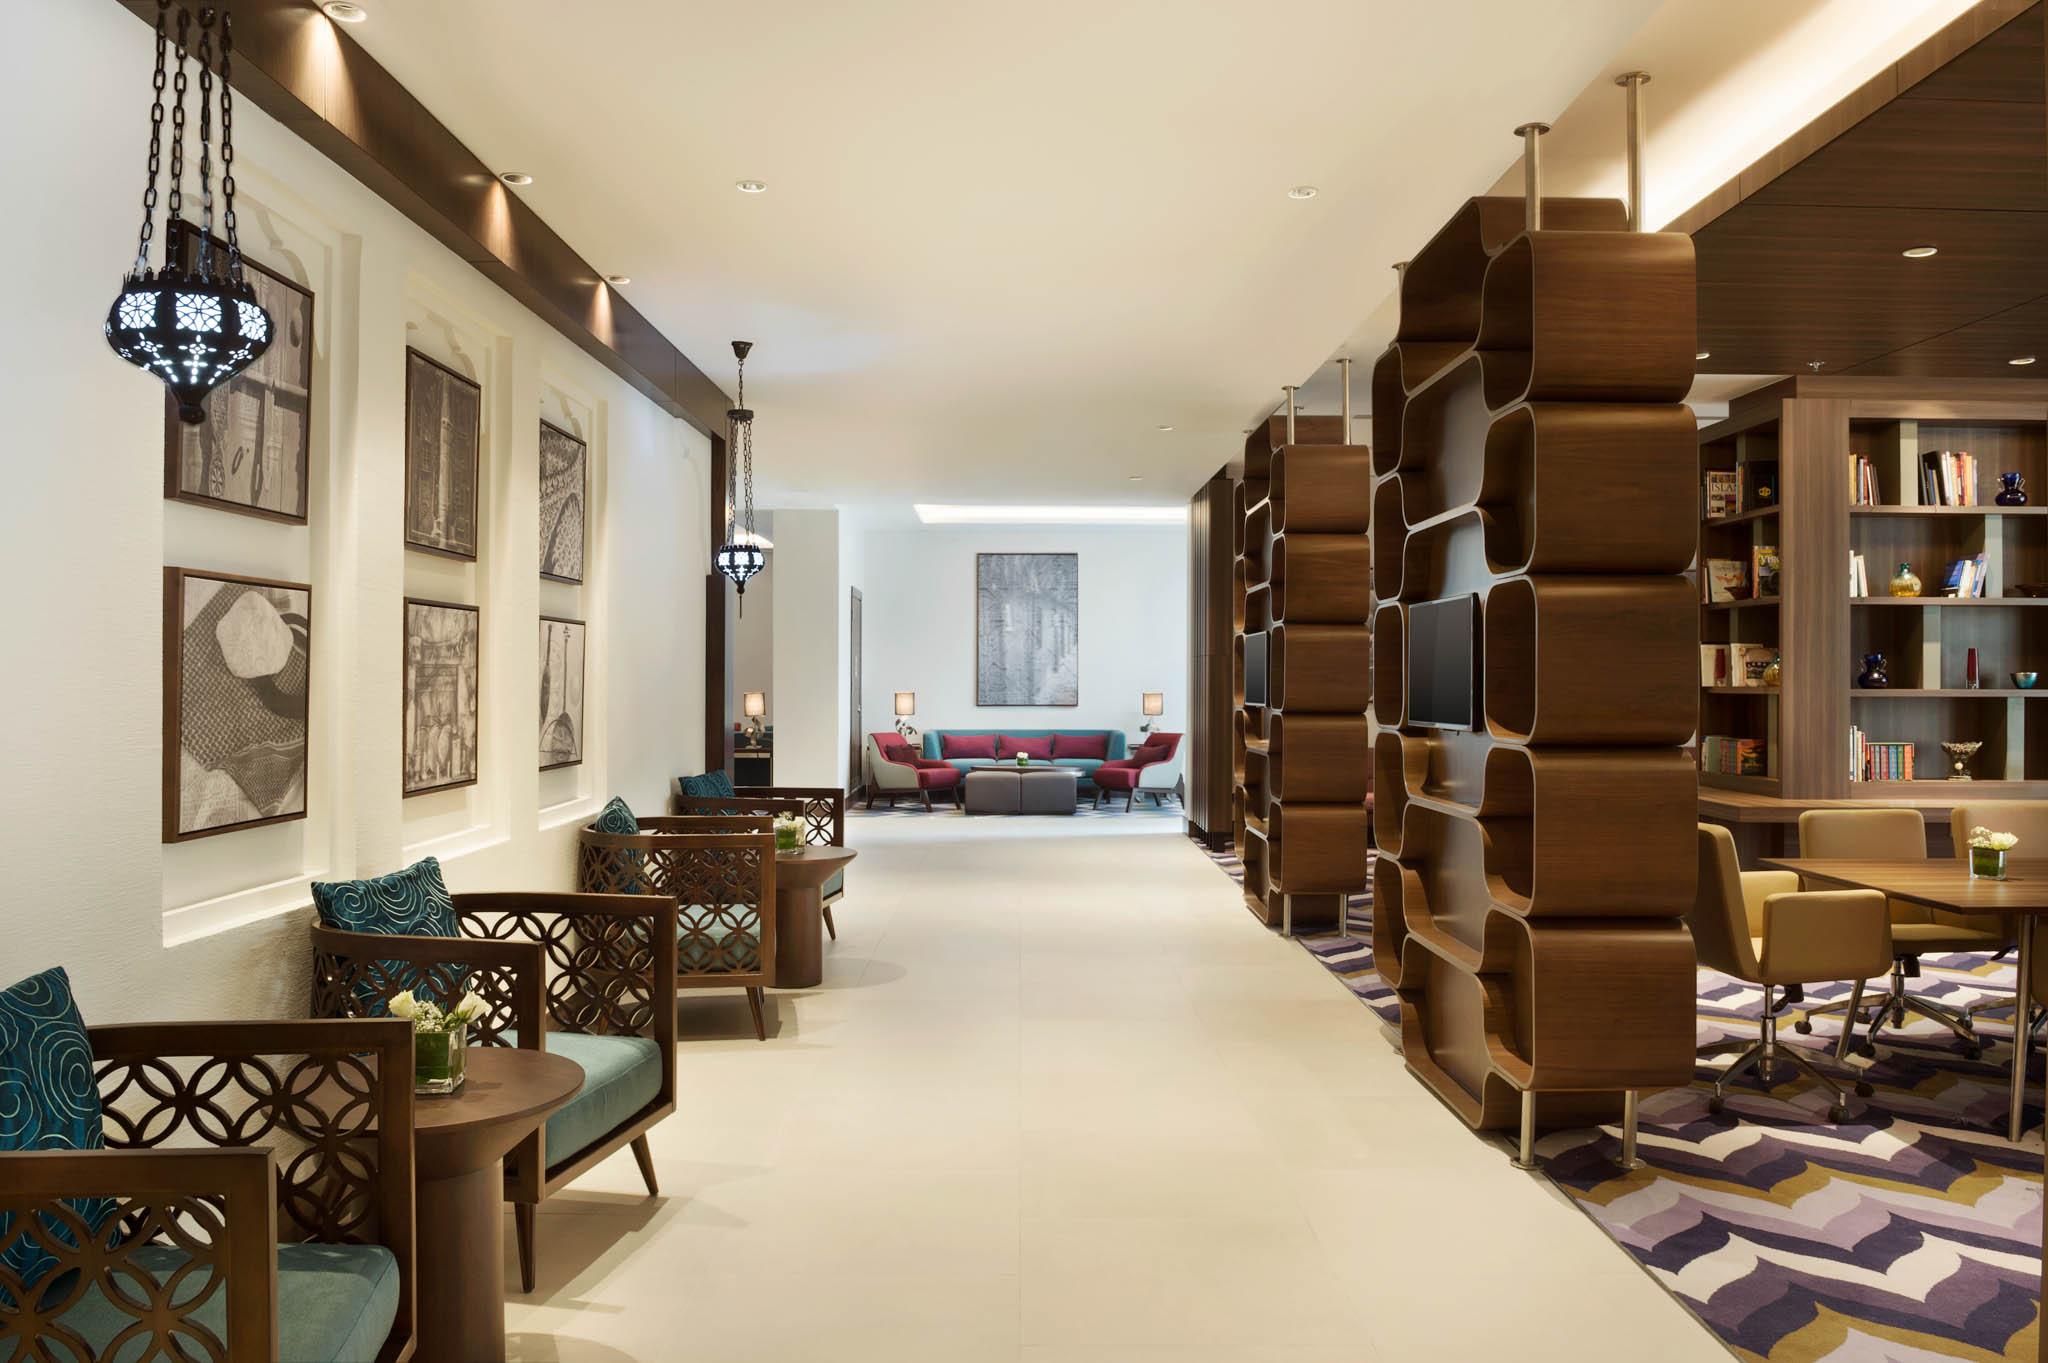 Hotel Photographer - Hamptons By Hilton Lobby